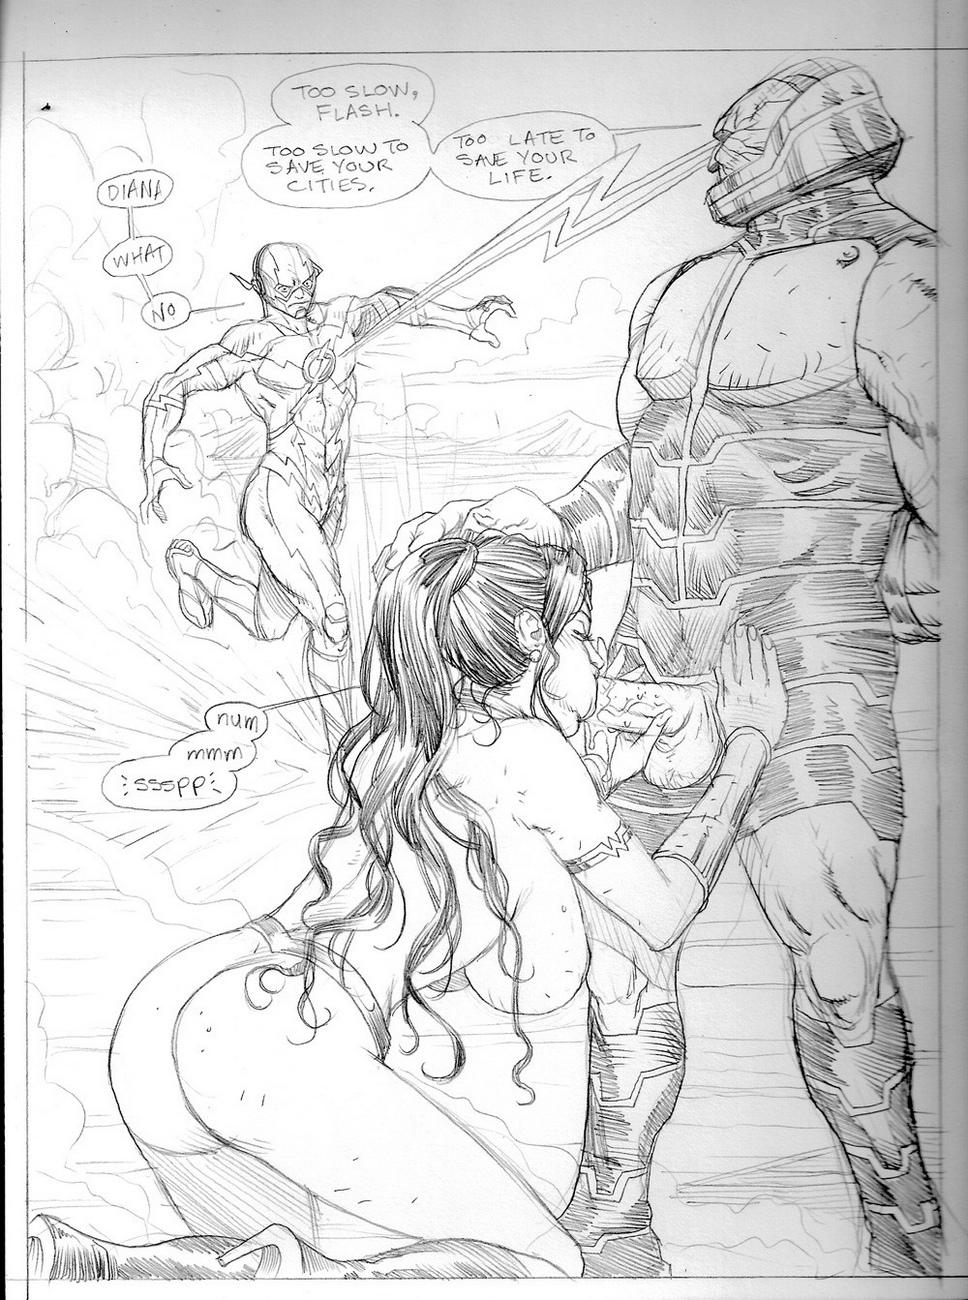 Whores-Of-Darkseid-1-Wonder-Woman 23 free sex comic